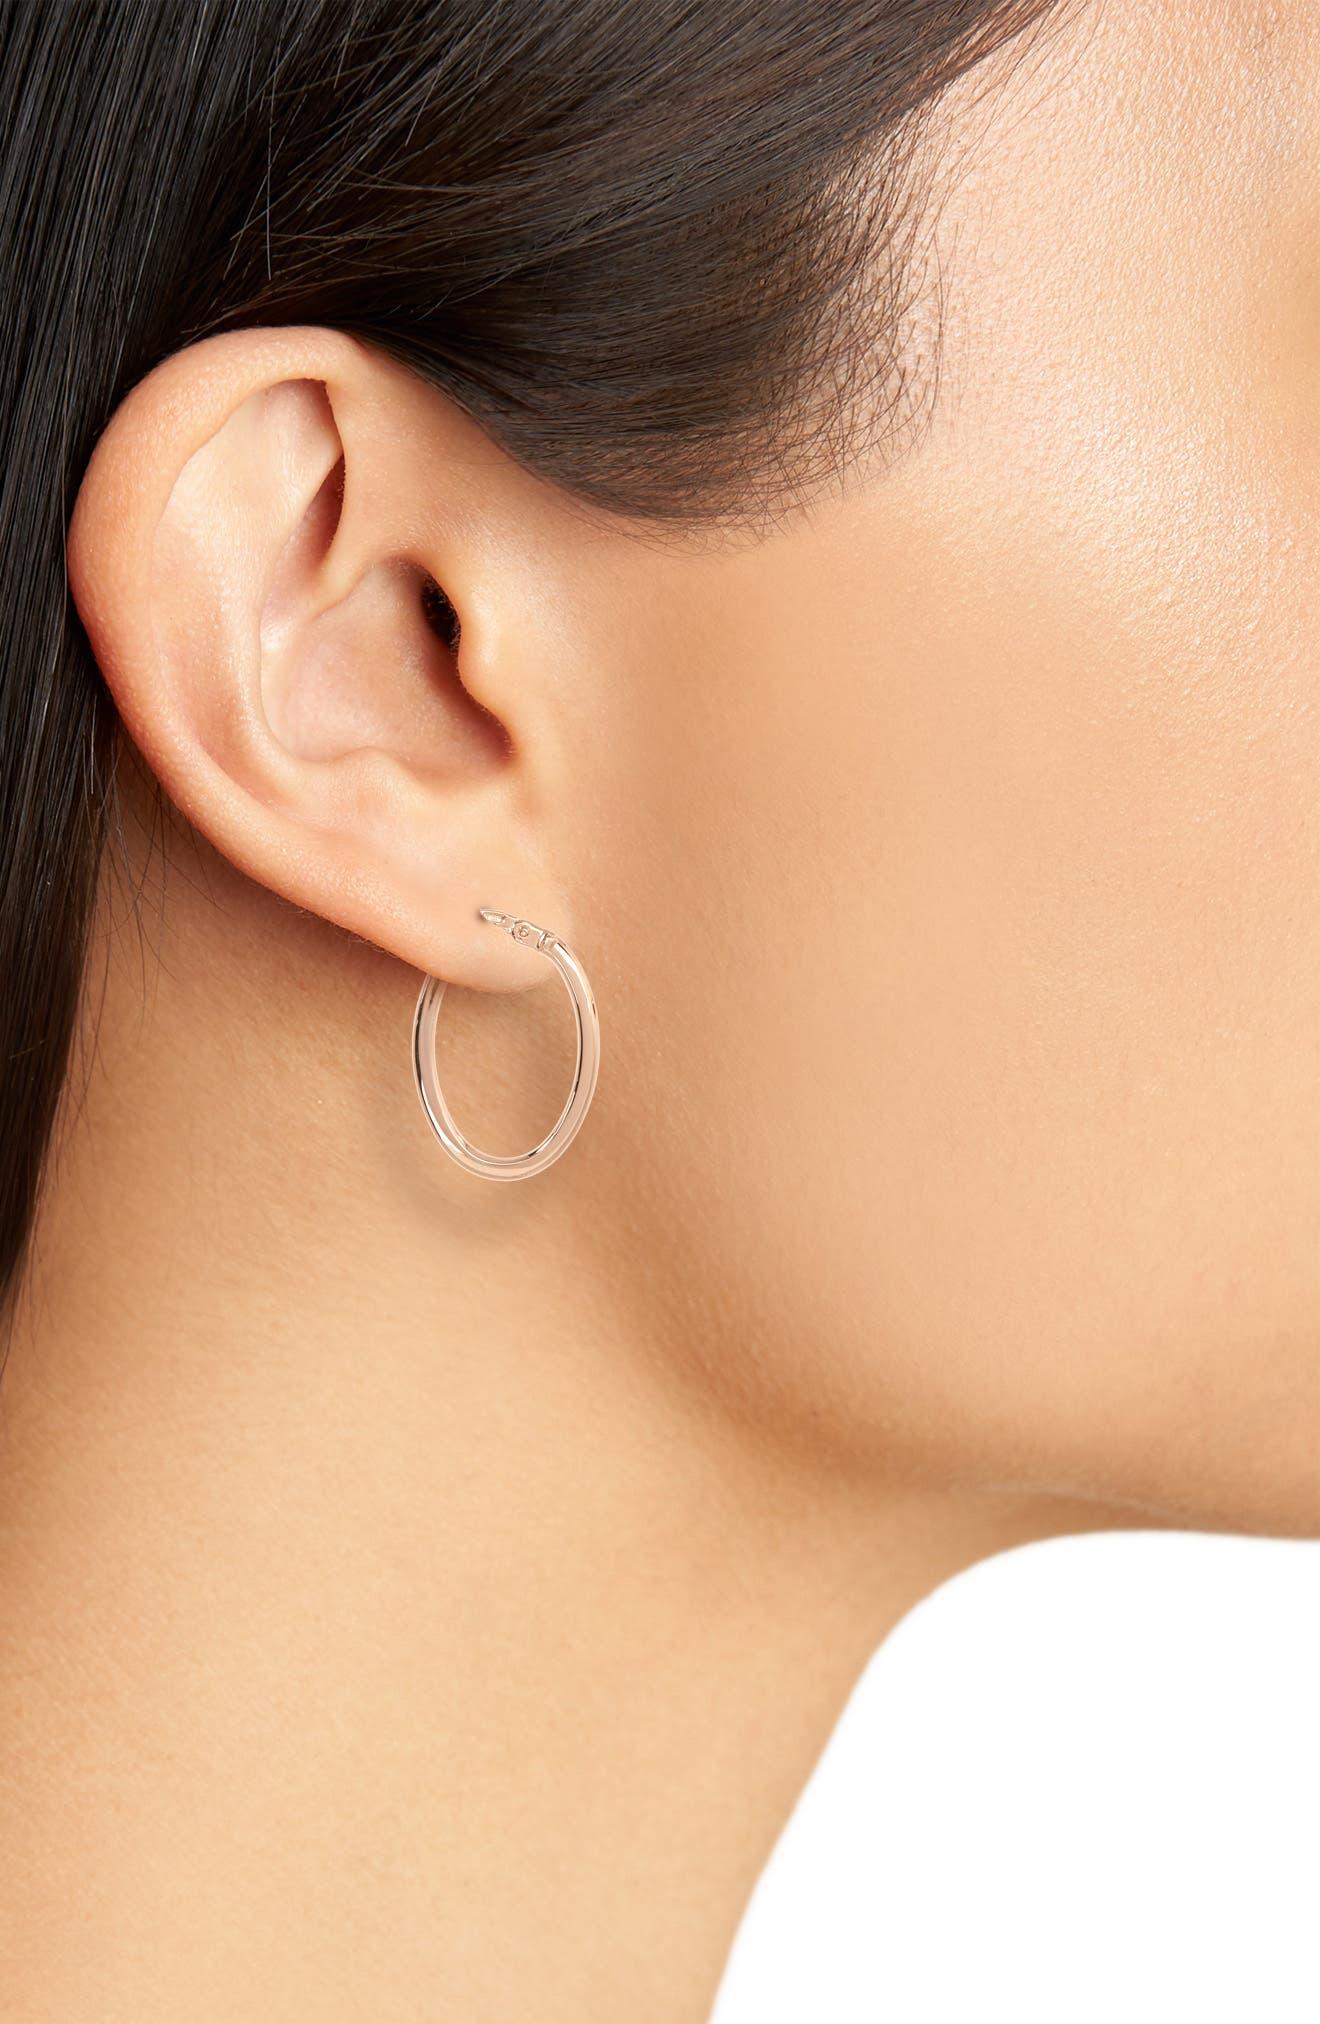 Medium Hoop Earrings,                             Alternate thumbnail 2, color,                             ROSE GOLD